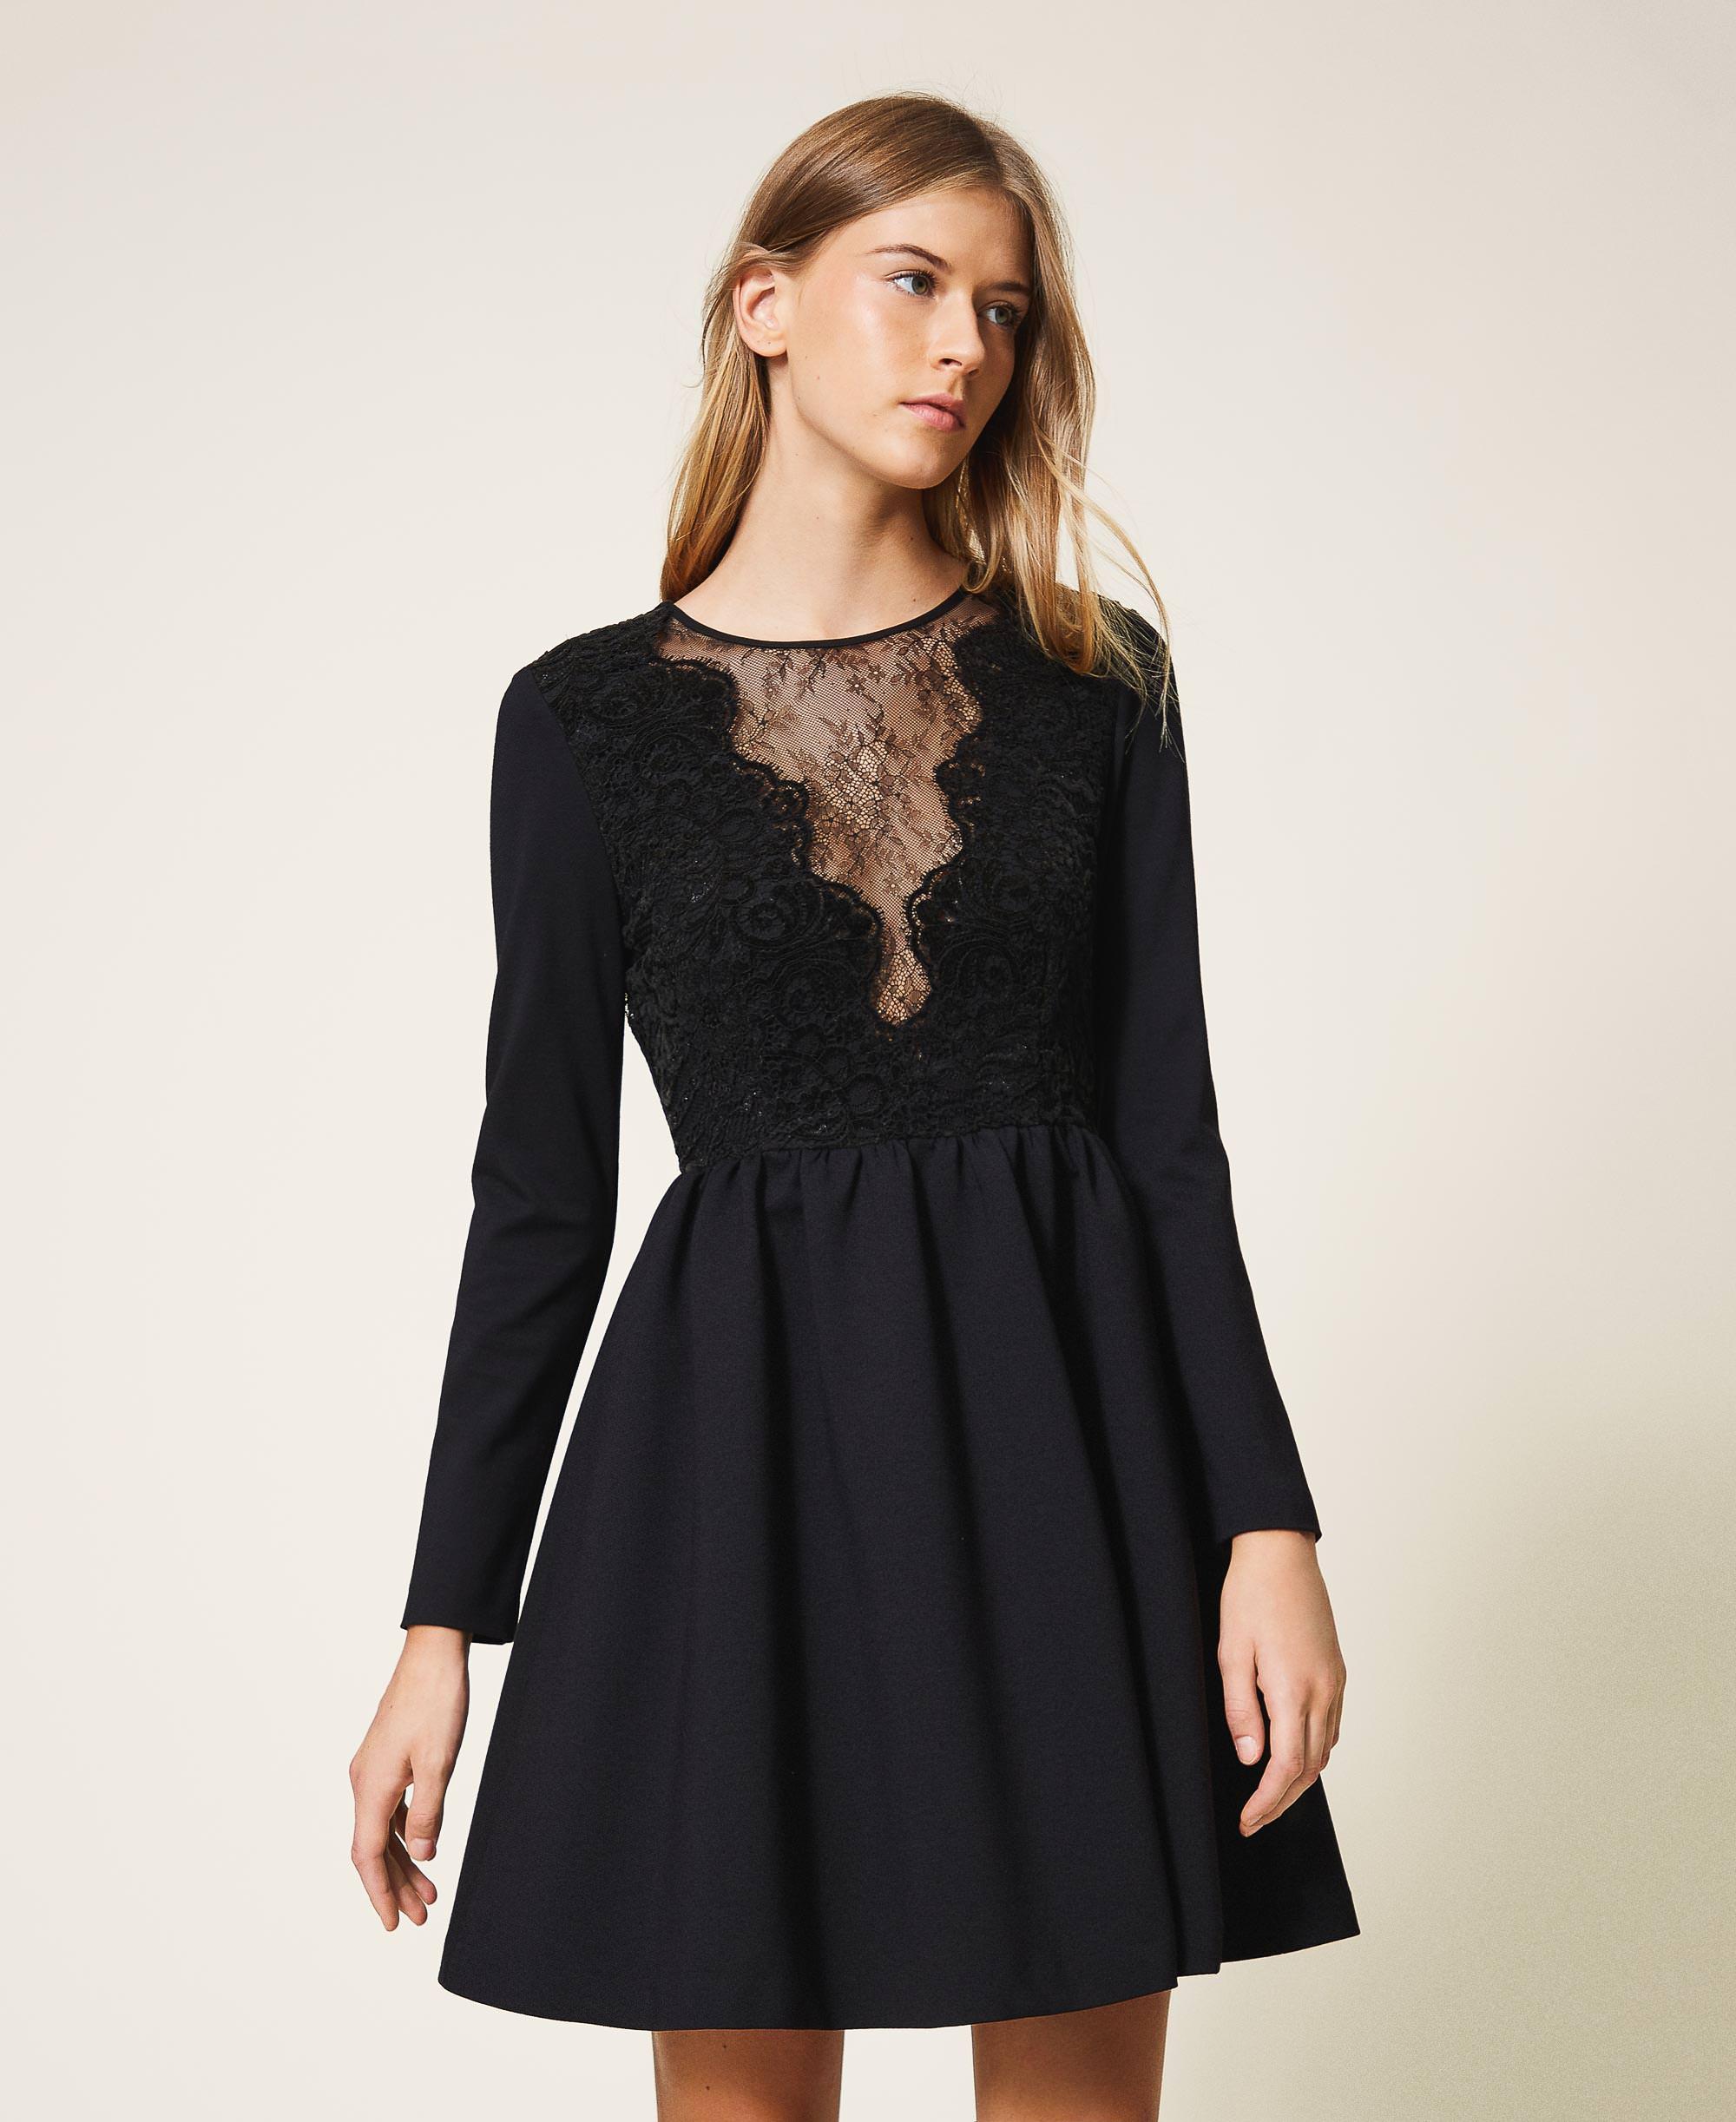 Kleid mit Spitze Frau, Schwarz  TWINSET Milano